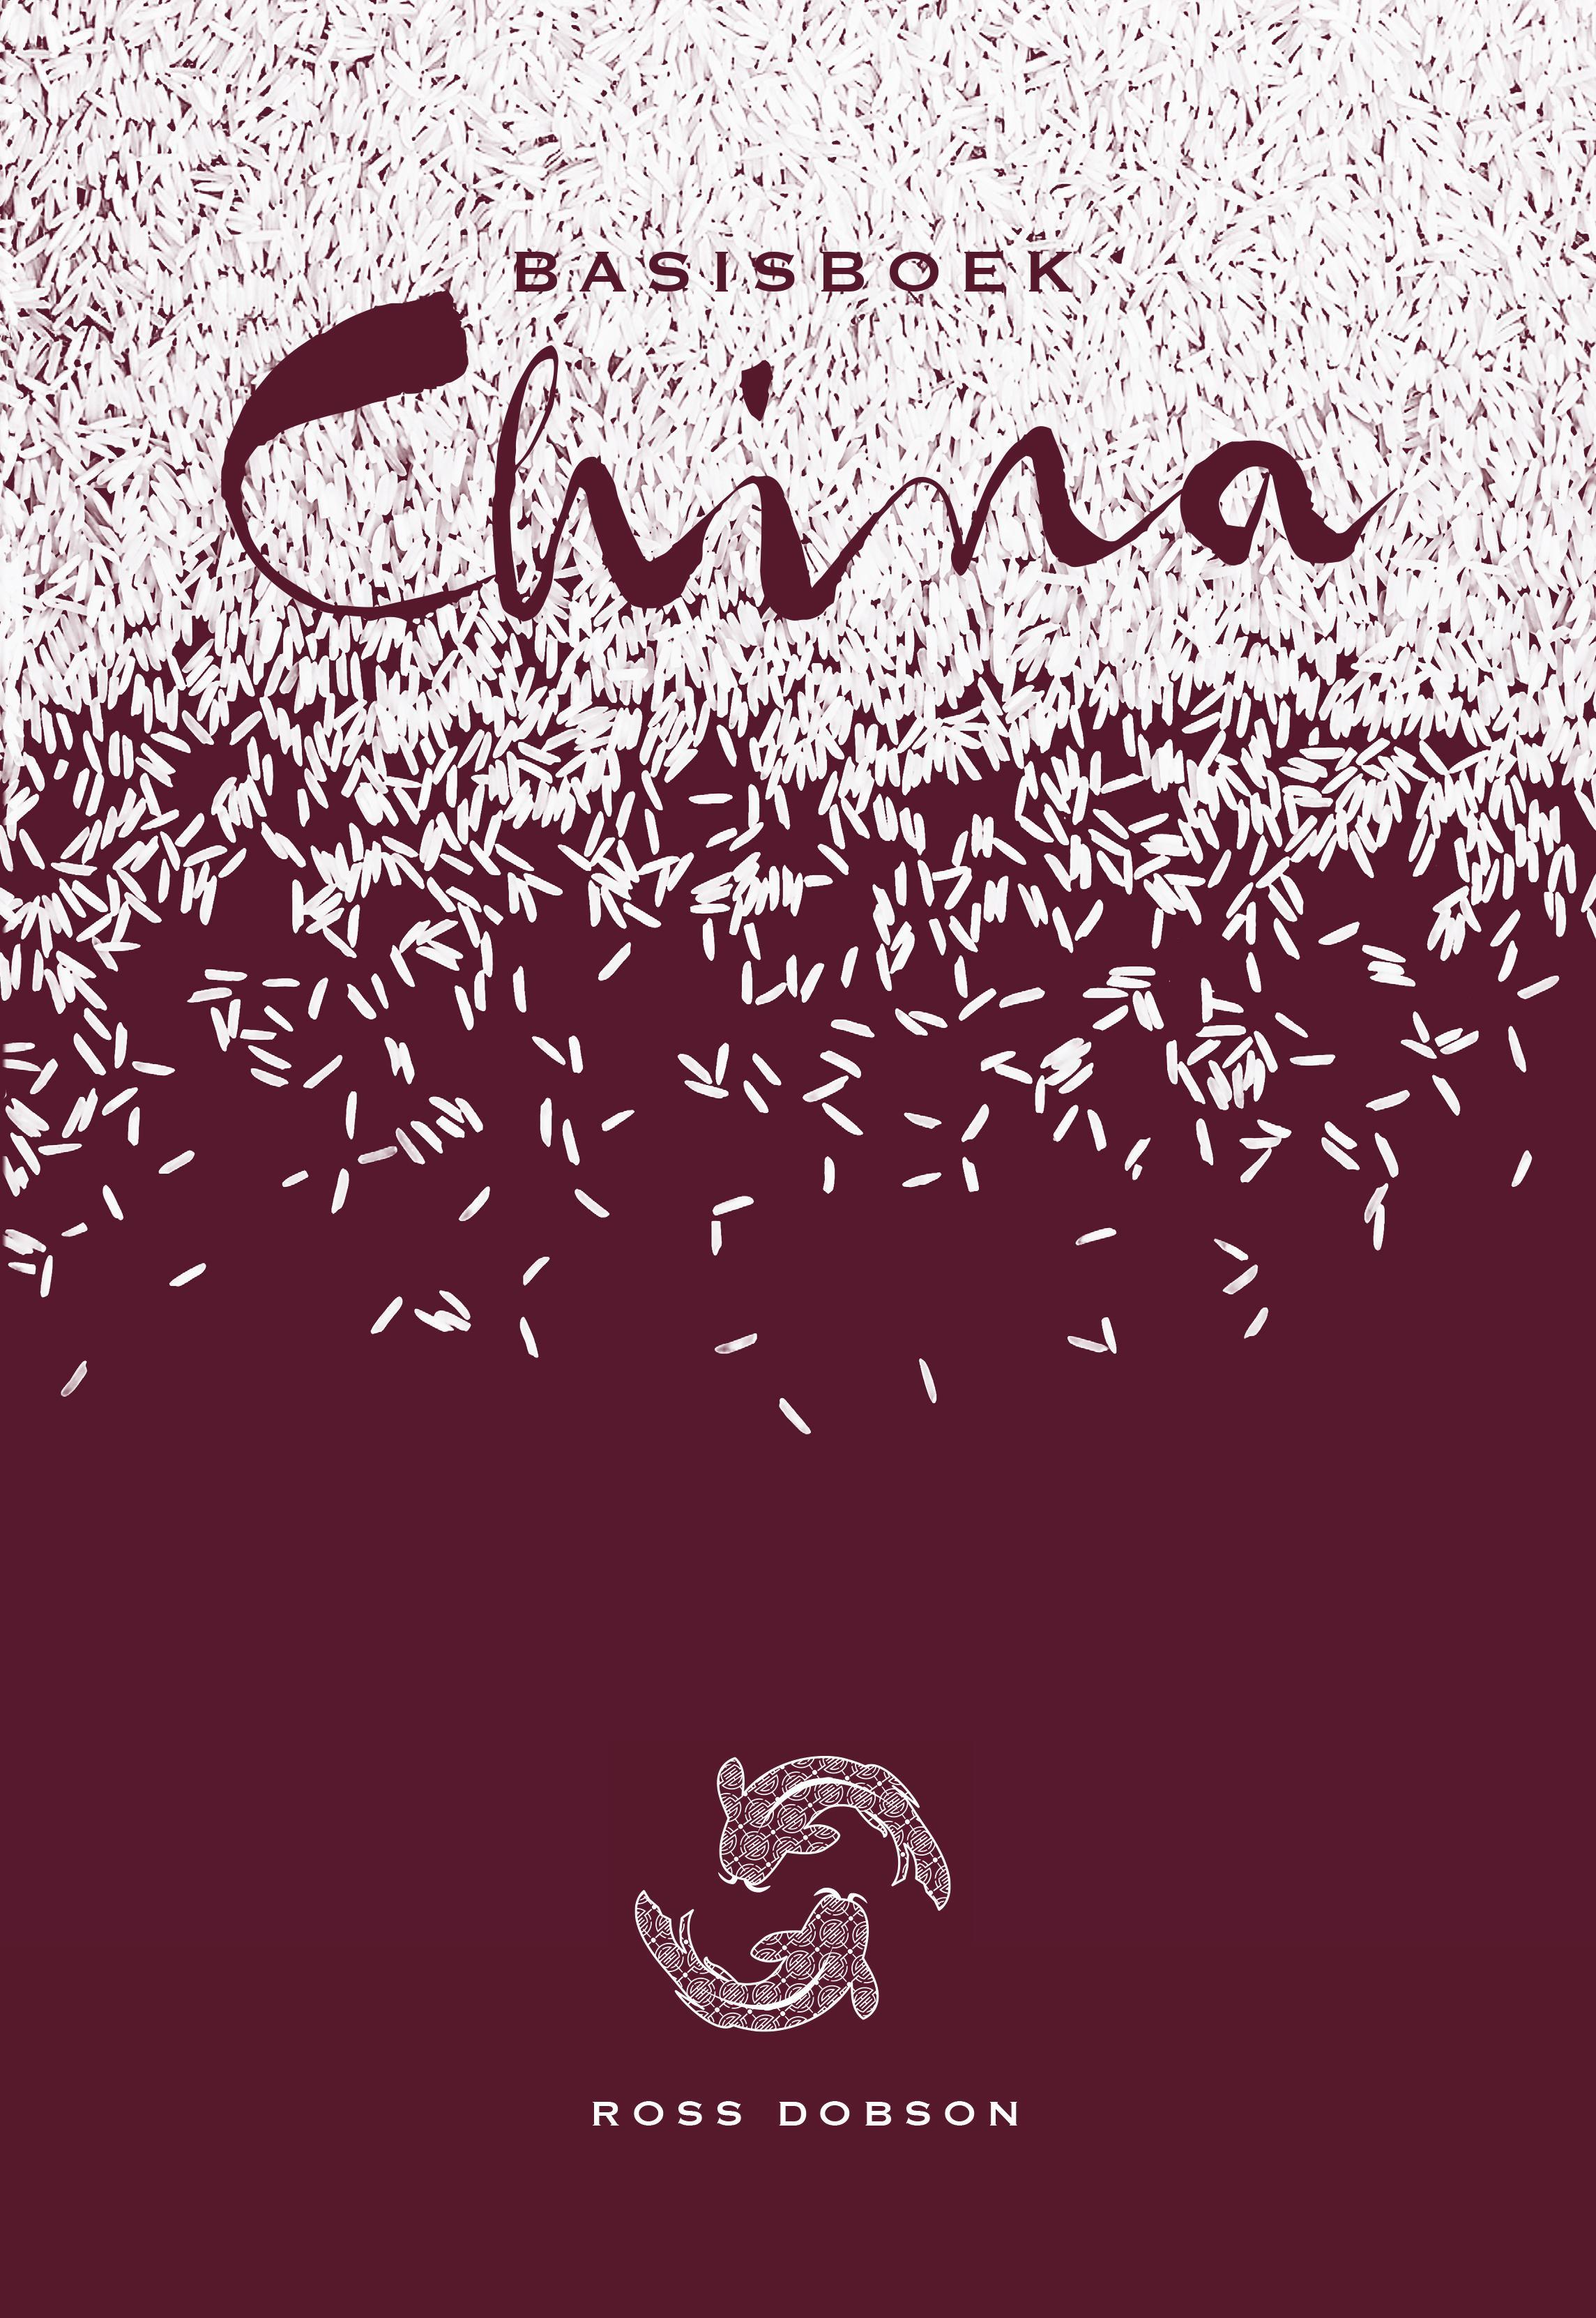 Basisboek China